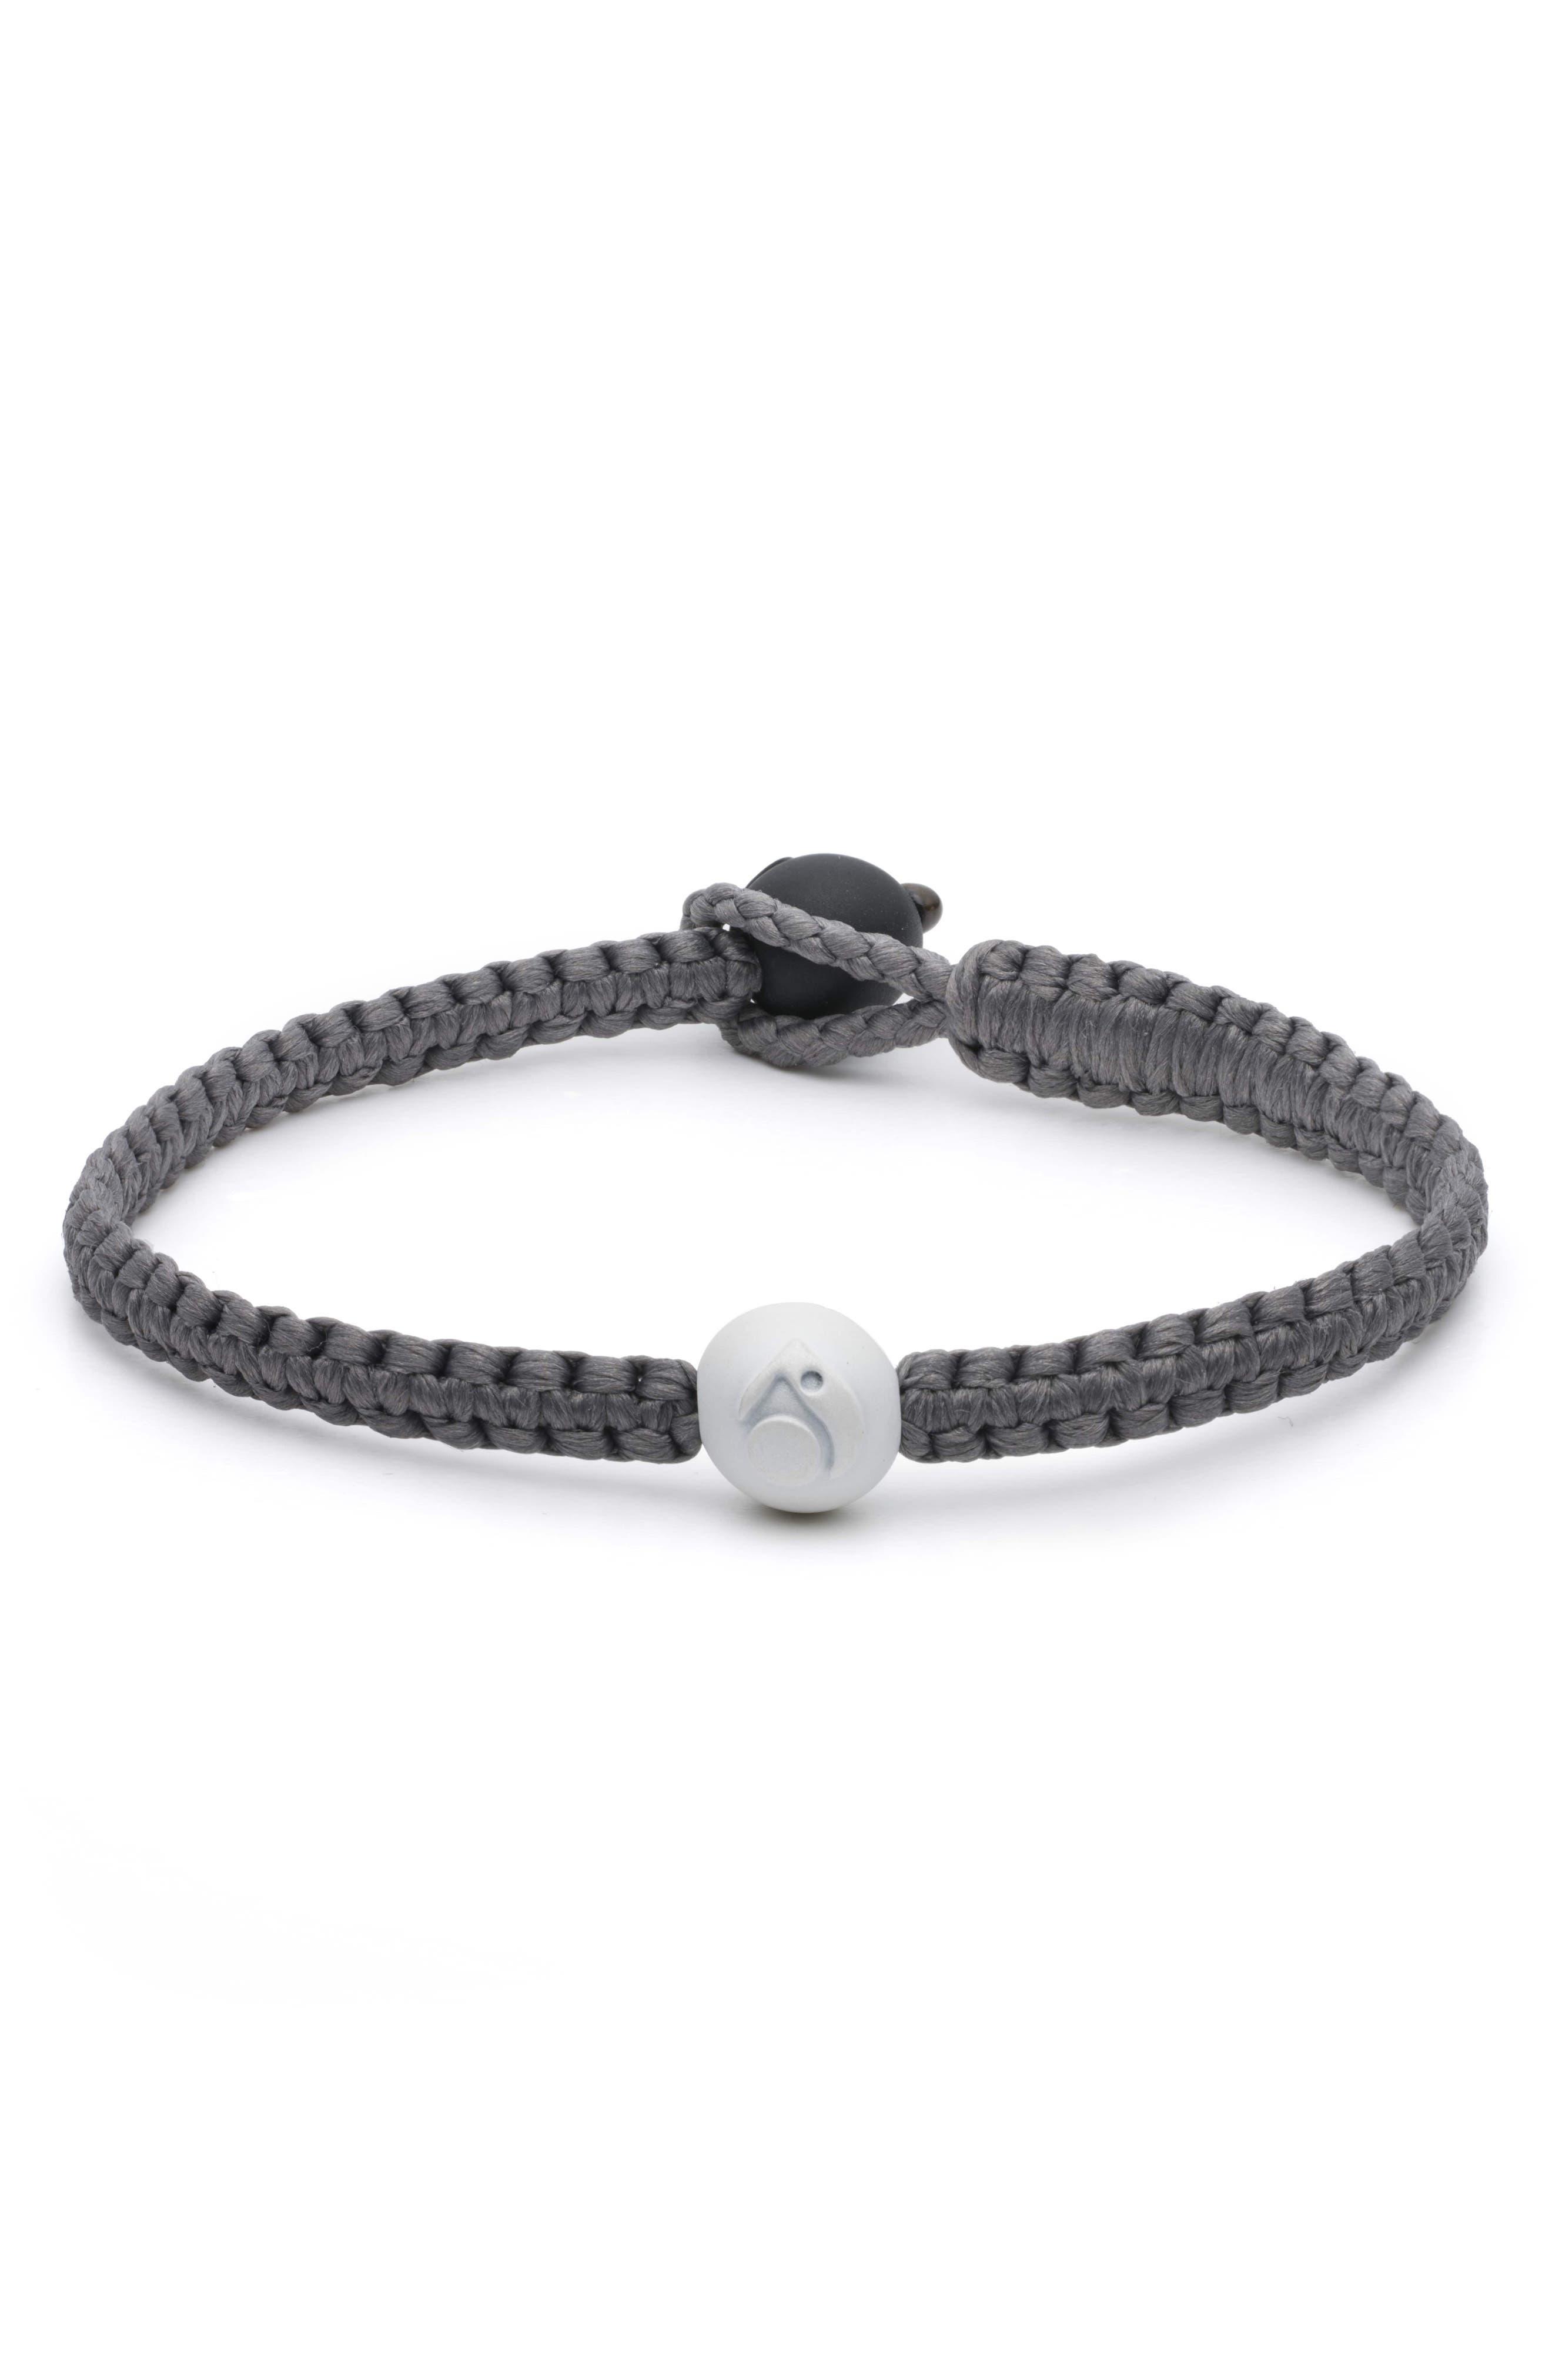 Single Wrap Bracelet,                             Main thumbnail 1, color,                             040